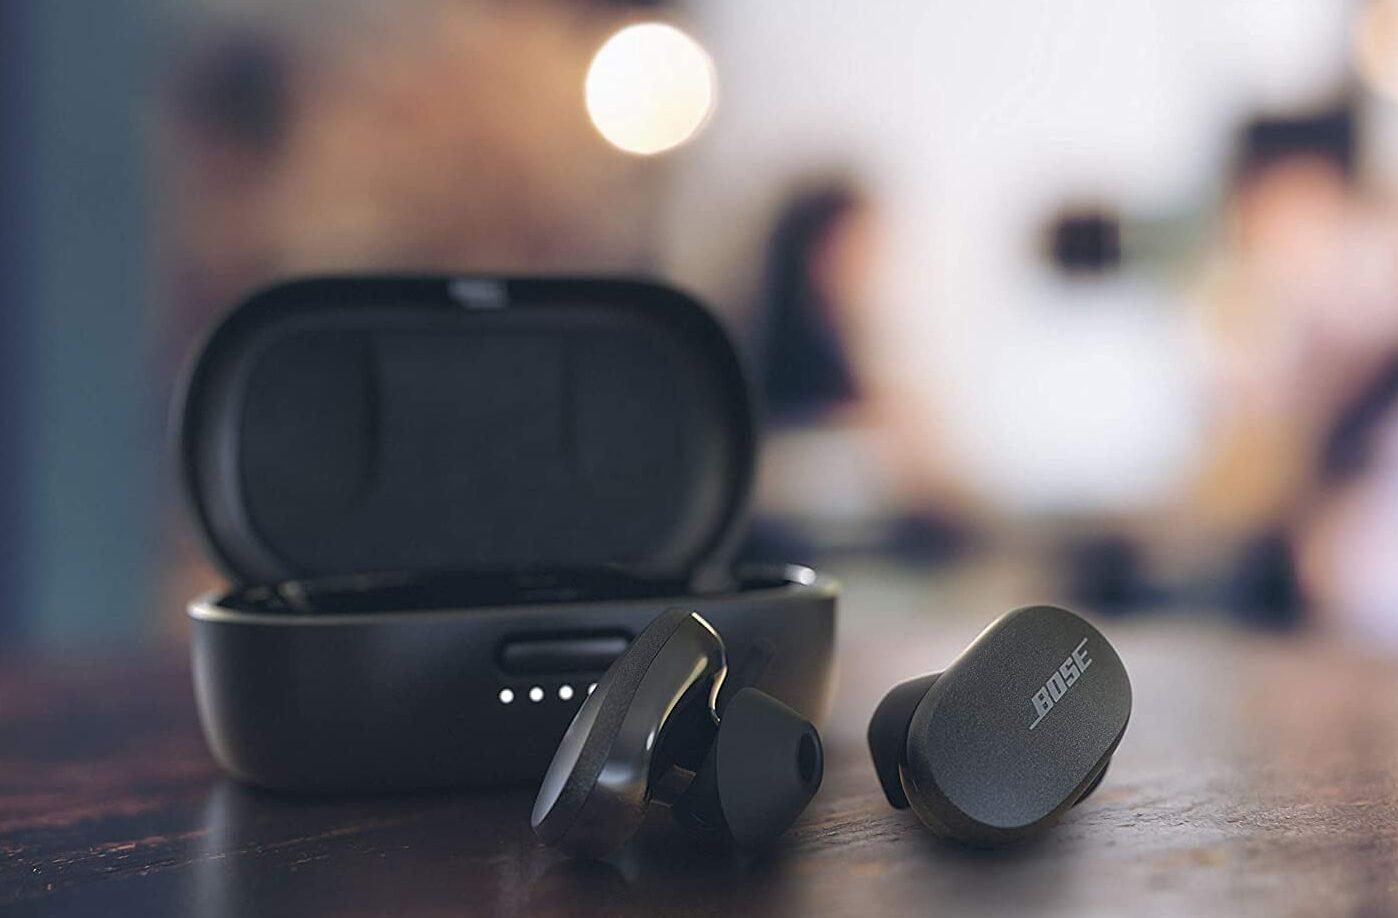 Bose QuietComfort earbuds press image